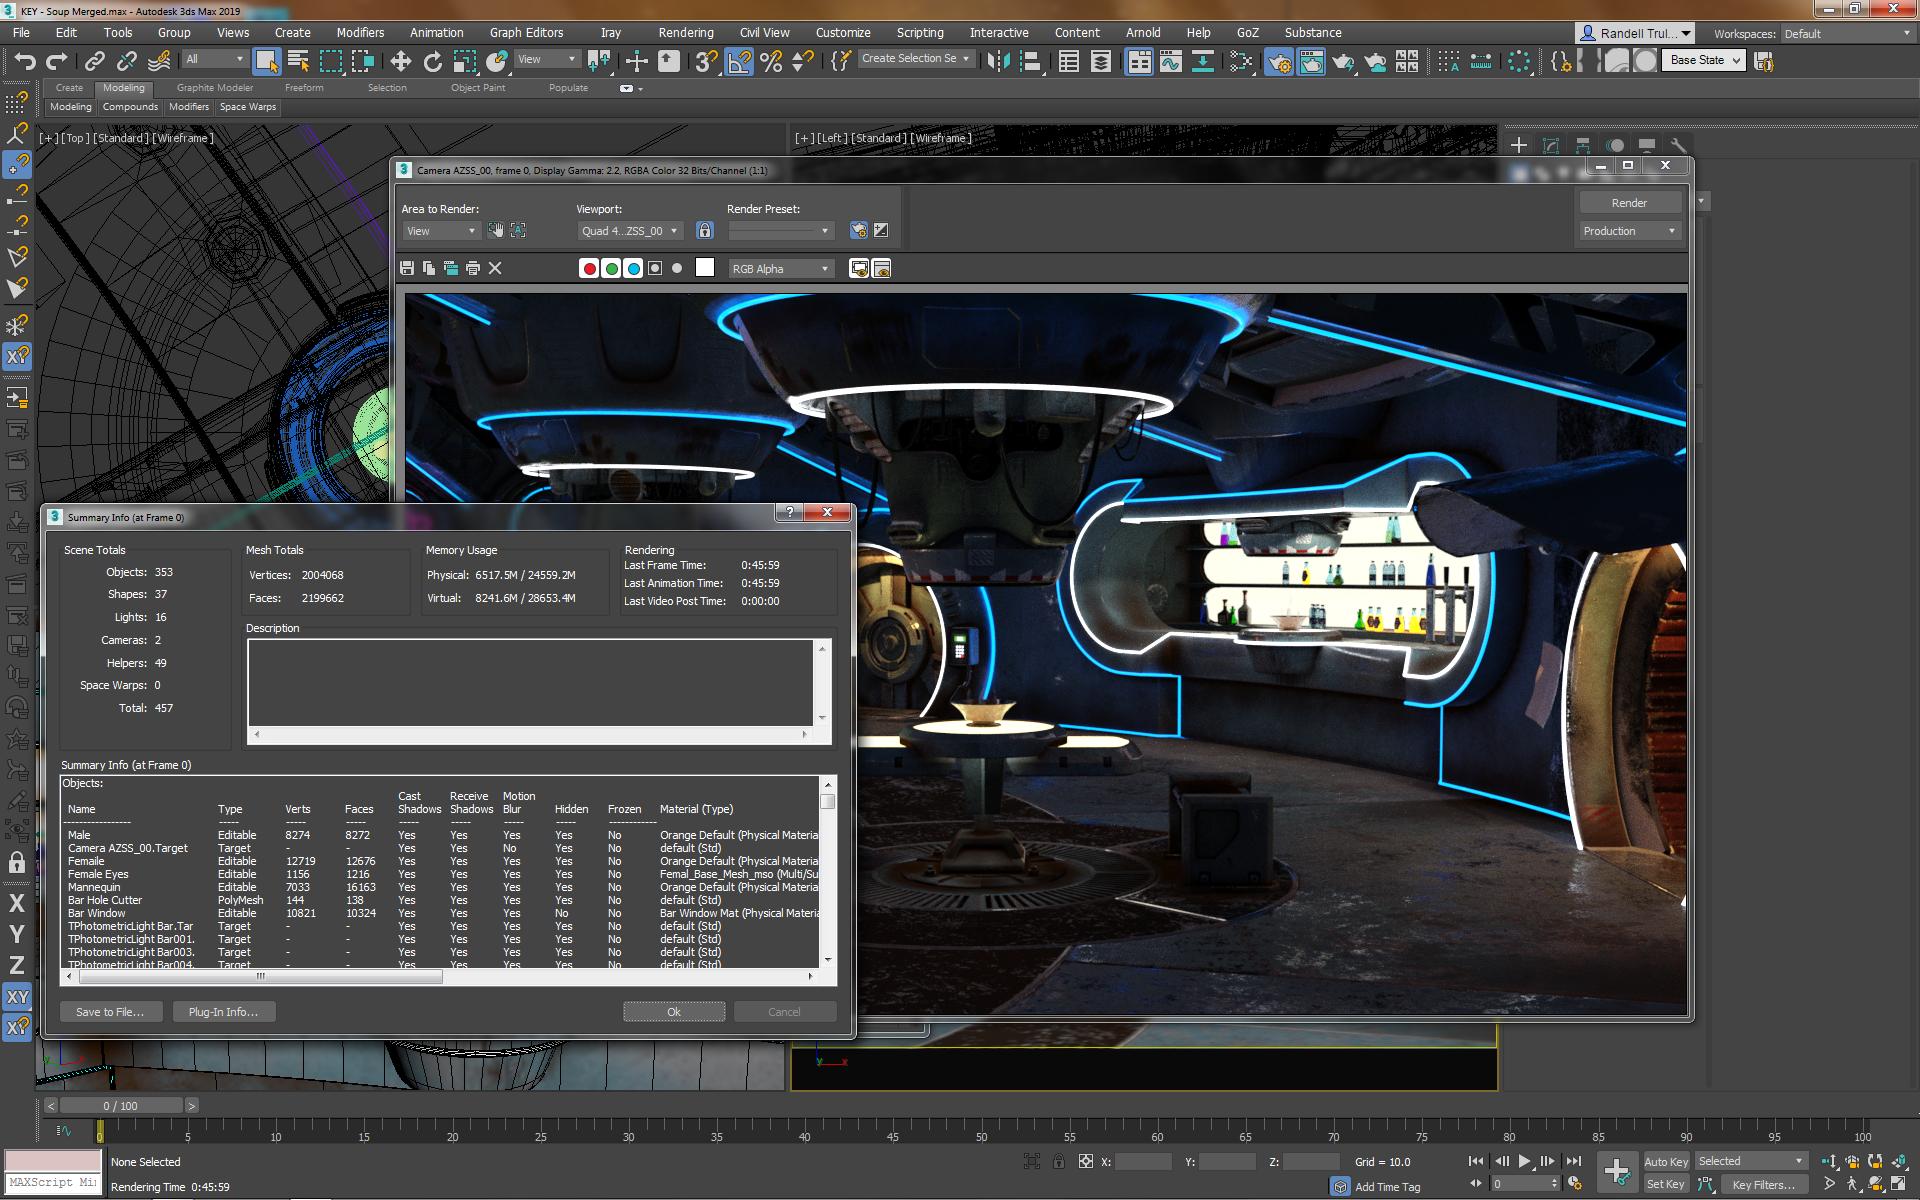 ART rendering speed 2019 vs 2020 - Autodesk Community- 3ds Max